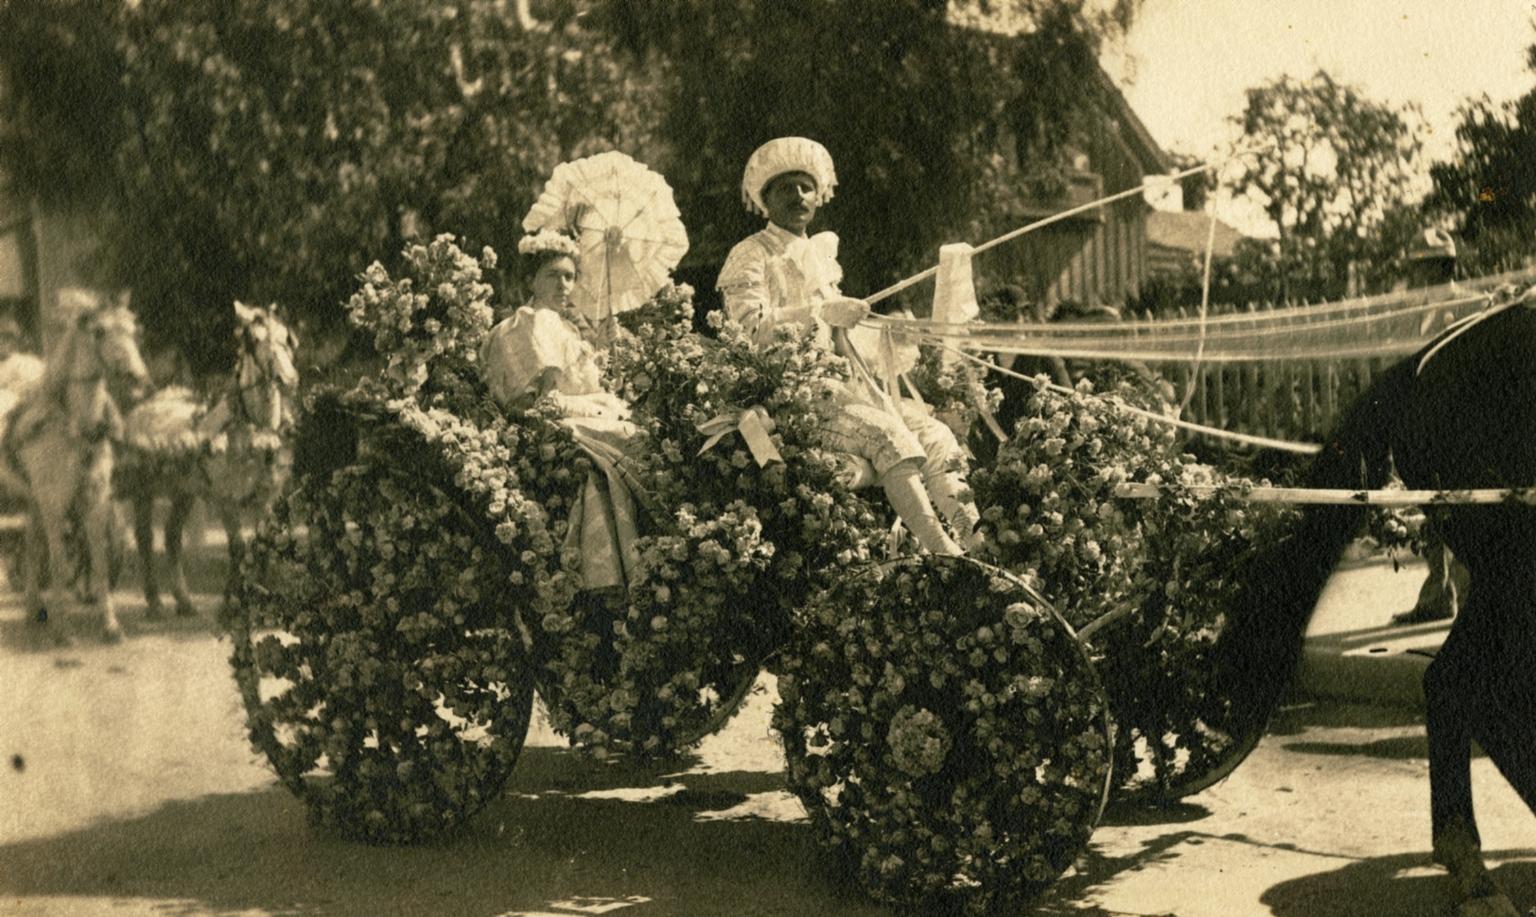 Flower Festival Carriage